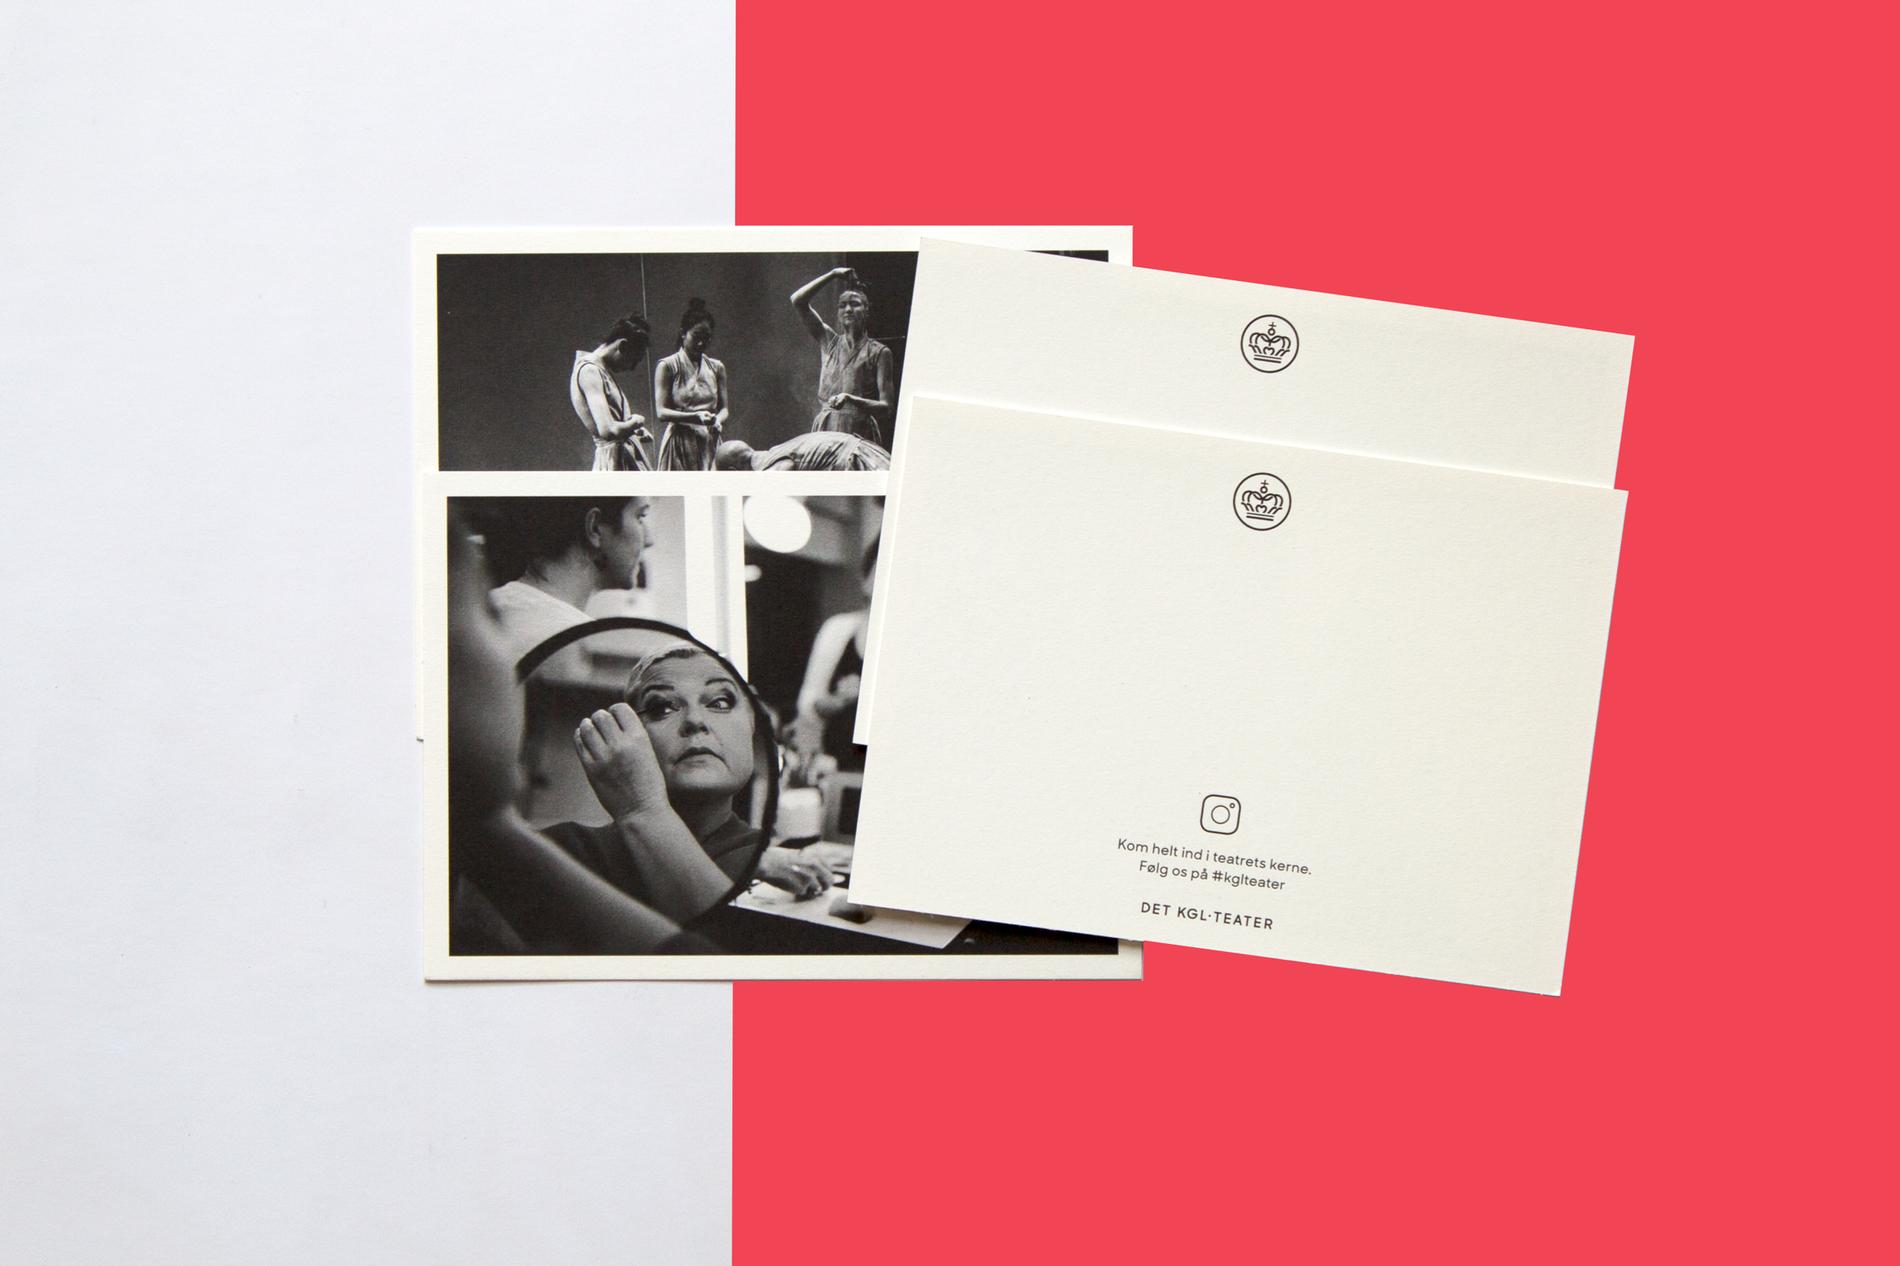 Sharp-Type-KGL-Theater-Print-PostCardSml